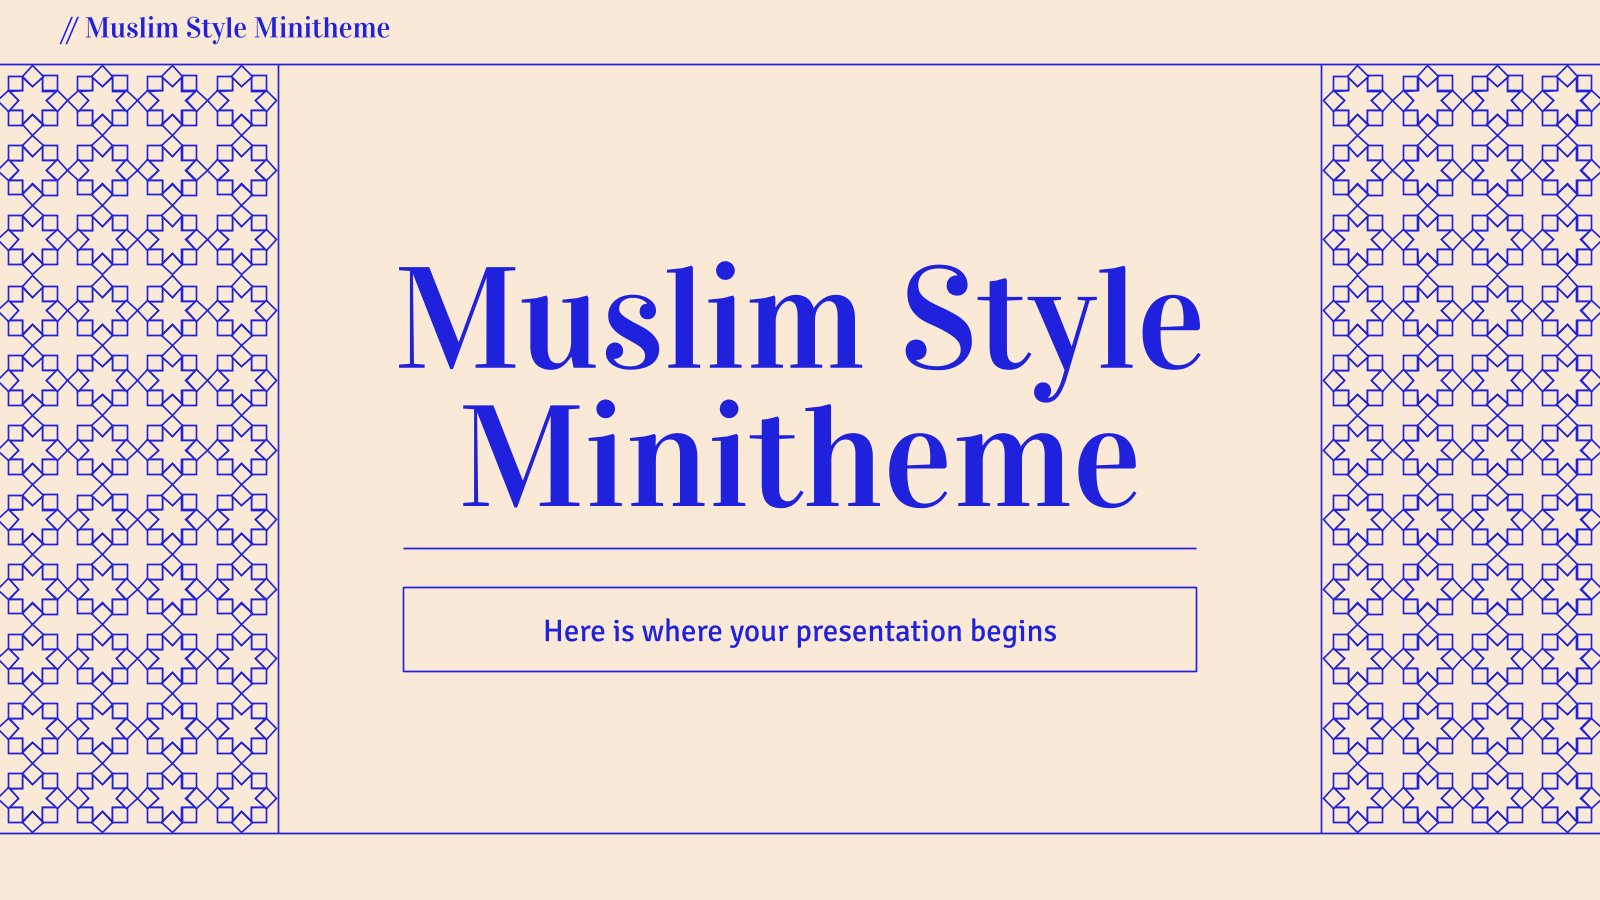 Muslim Style Minitheme presentation template